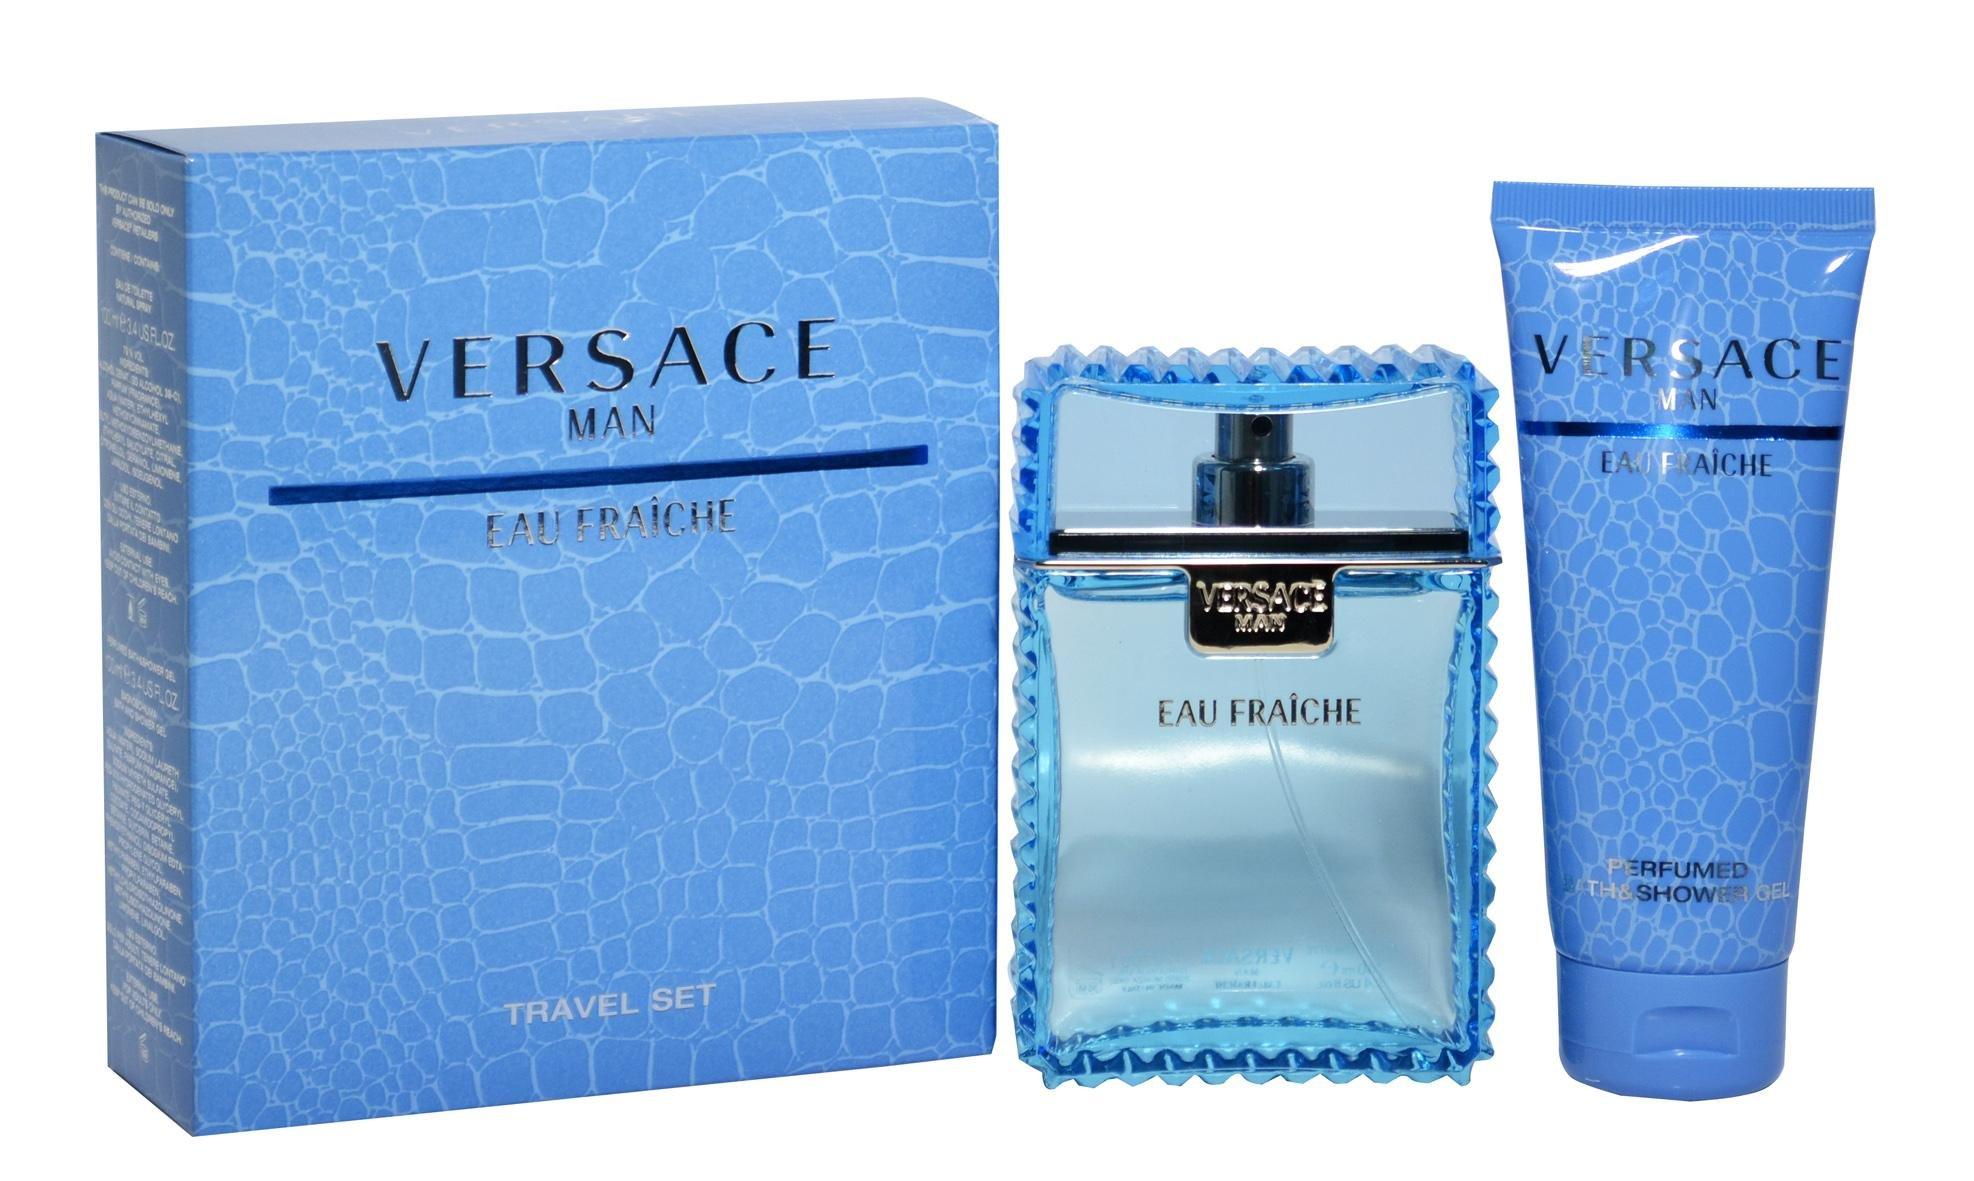 Versace Eau Fraiche Men Gift Set (Eau De Toilette Spray, Perfumed Bath and Shower Gel)